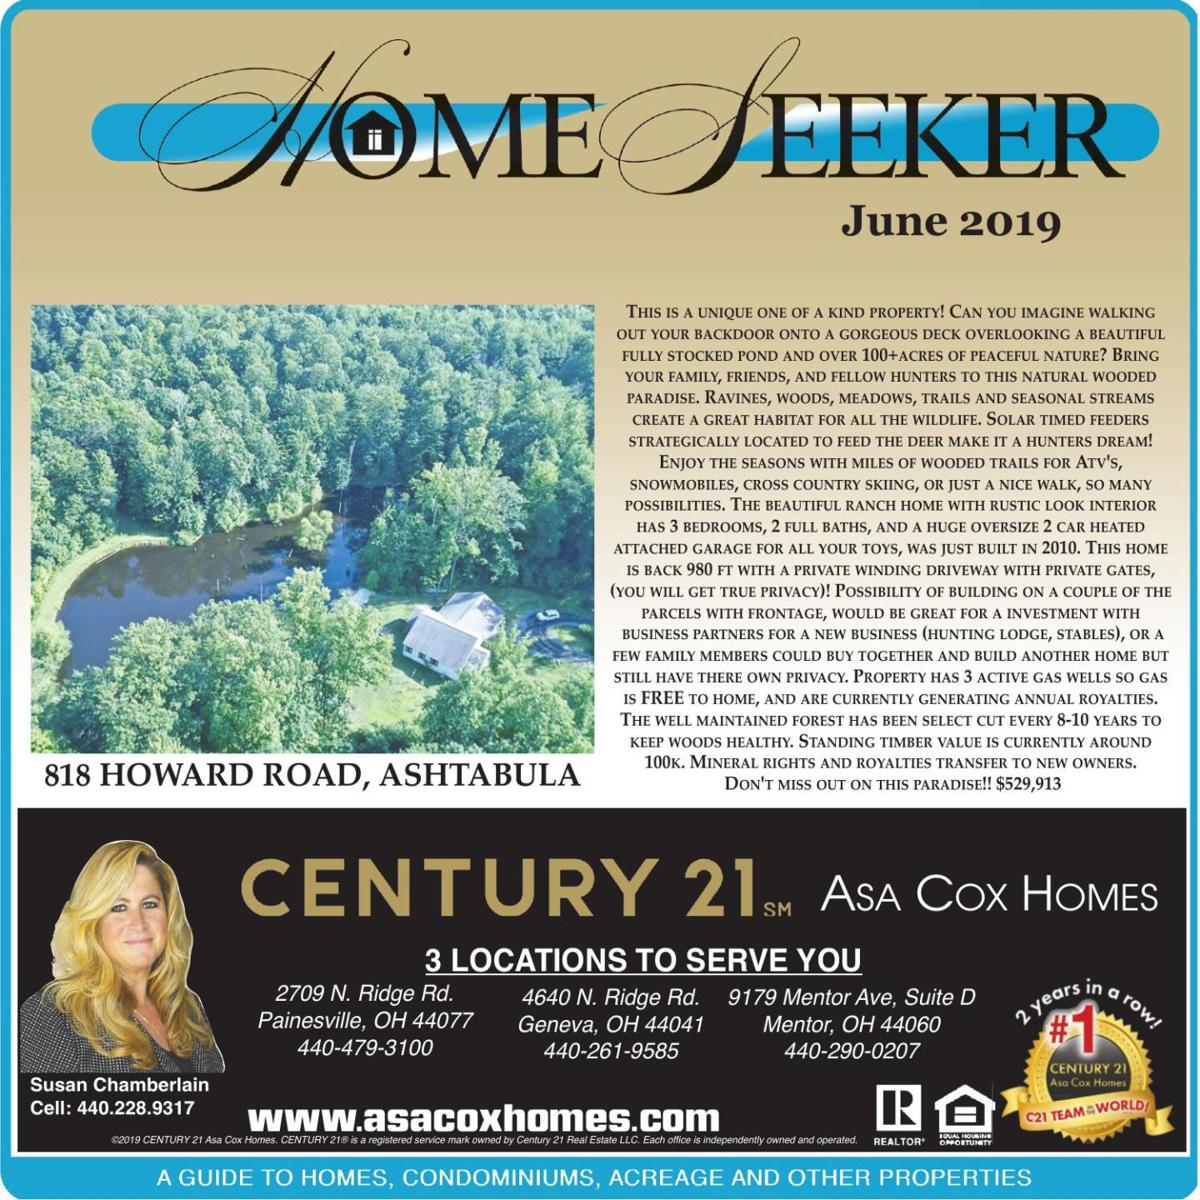 HOMESEEKER - JUNE 2019